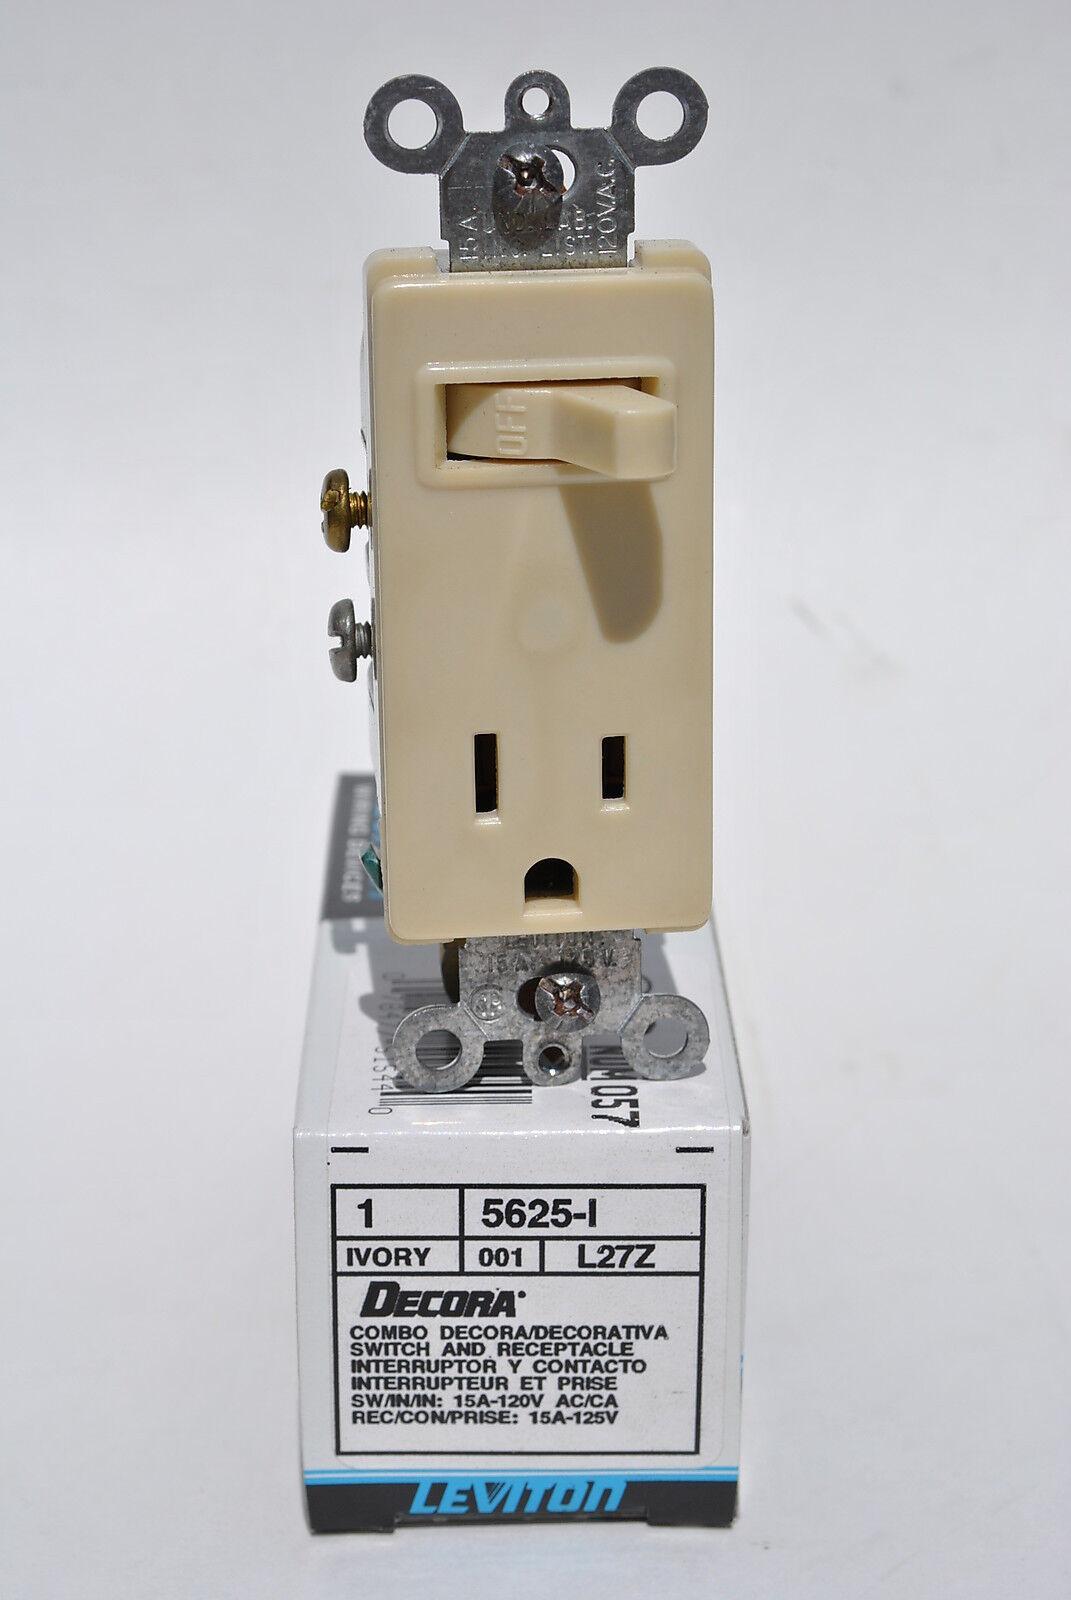 hight resolution of leviton 5625 i ivory combination decora single pole toggle switch receptacle for sale online ebay